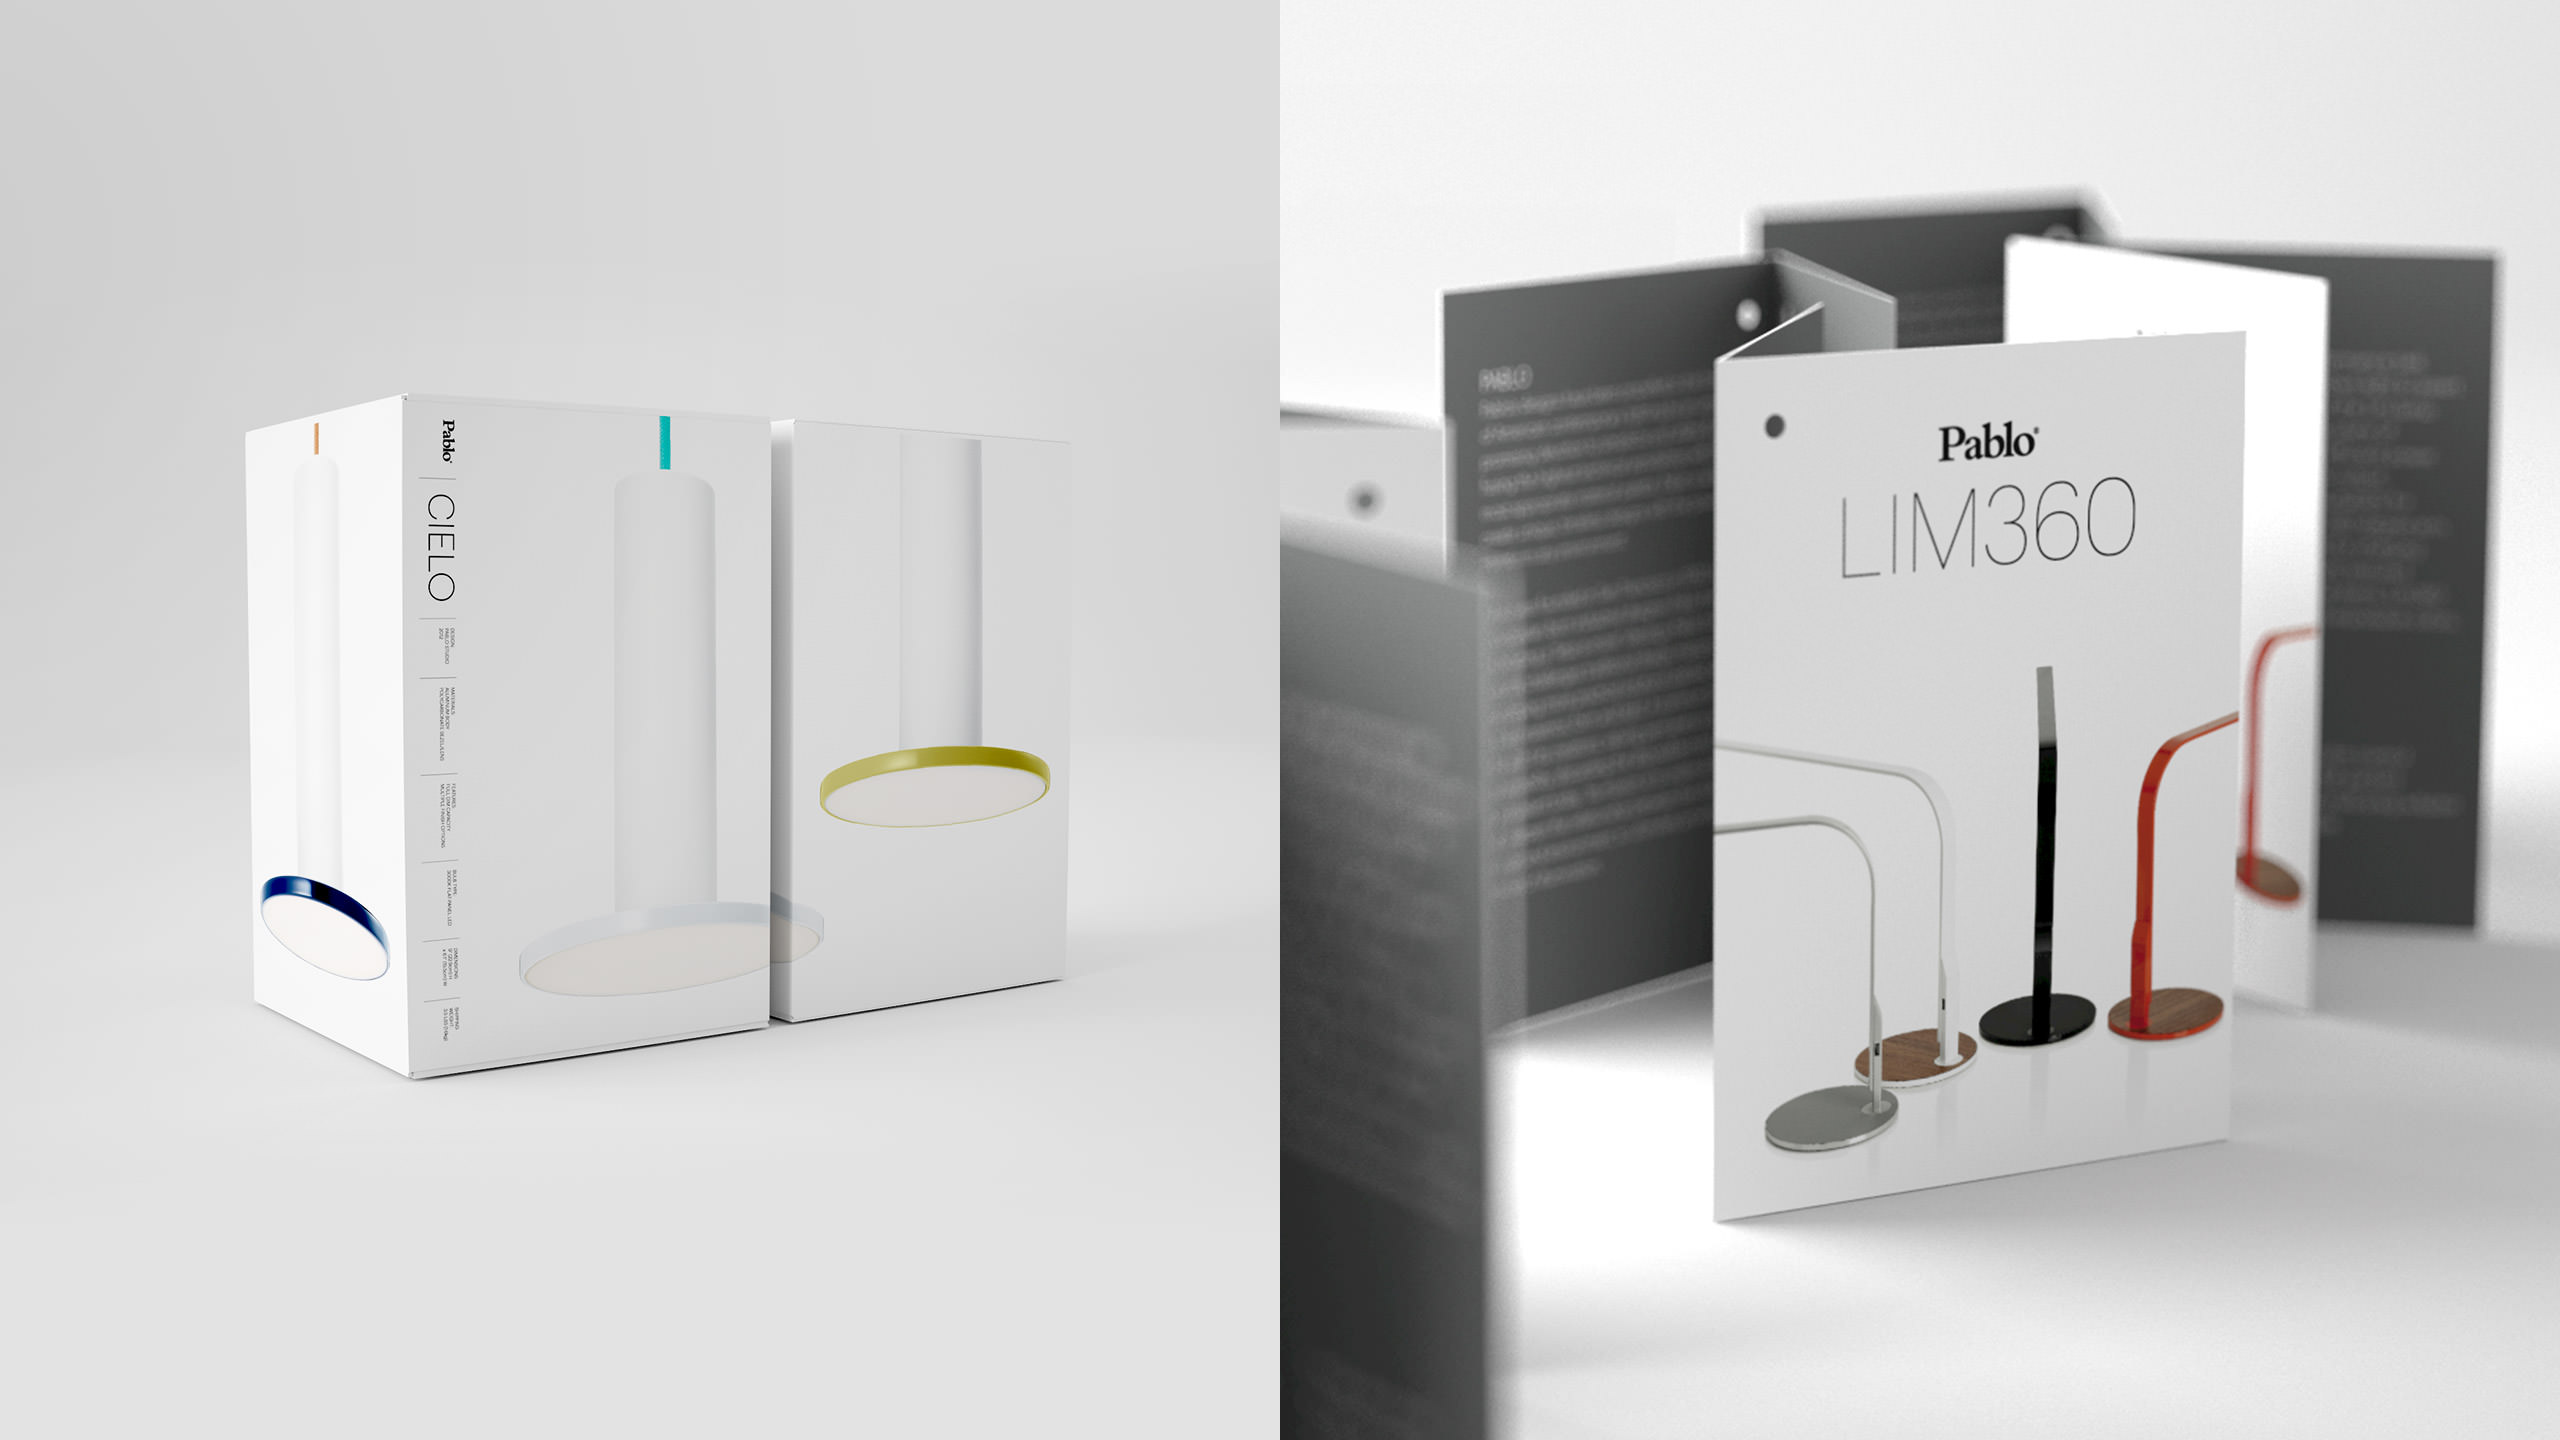 pablodesigns-brand-packaging-cielo-hangtags-lim360-2up